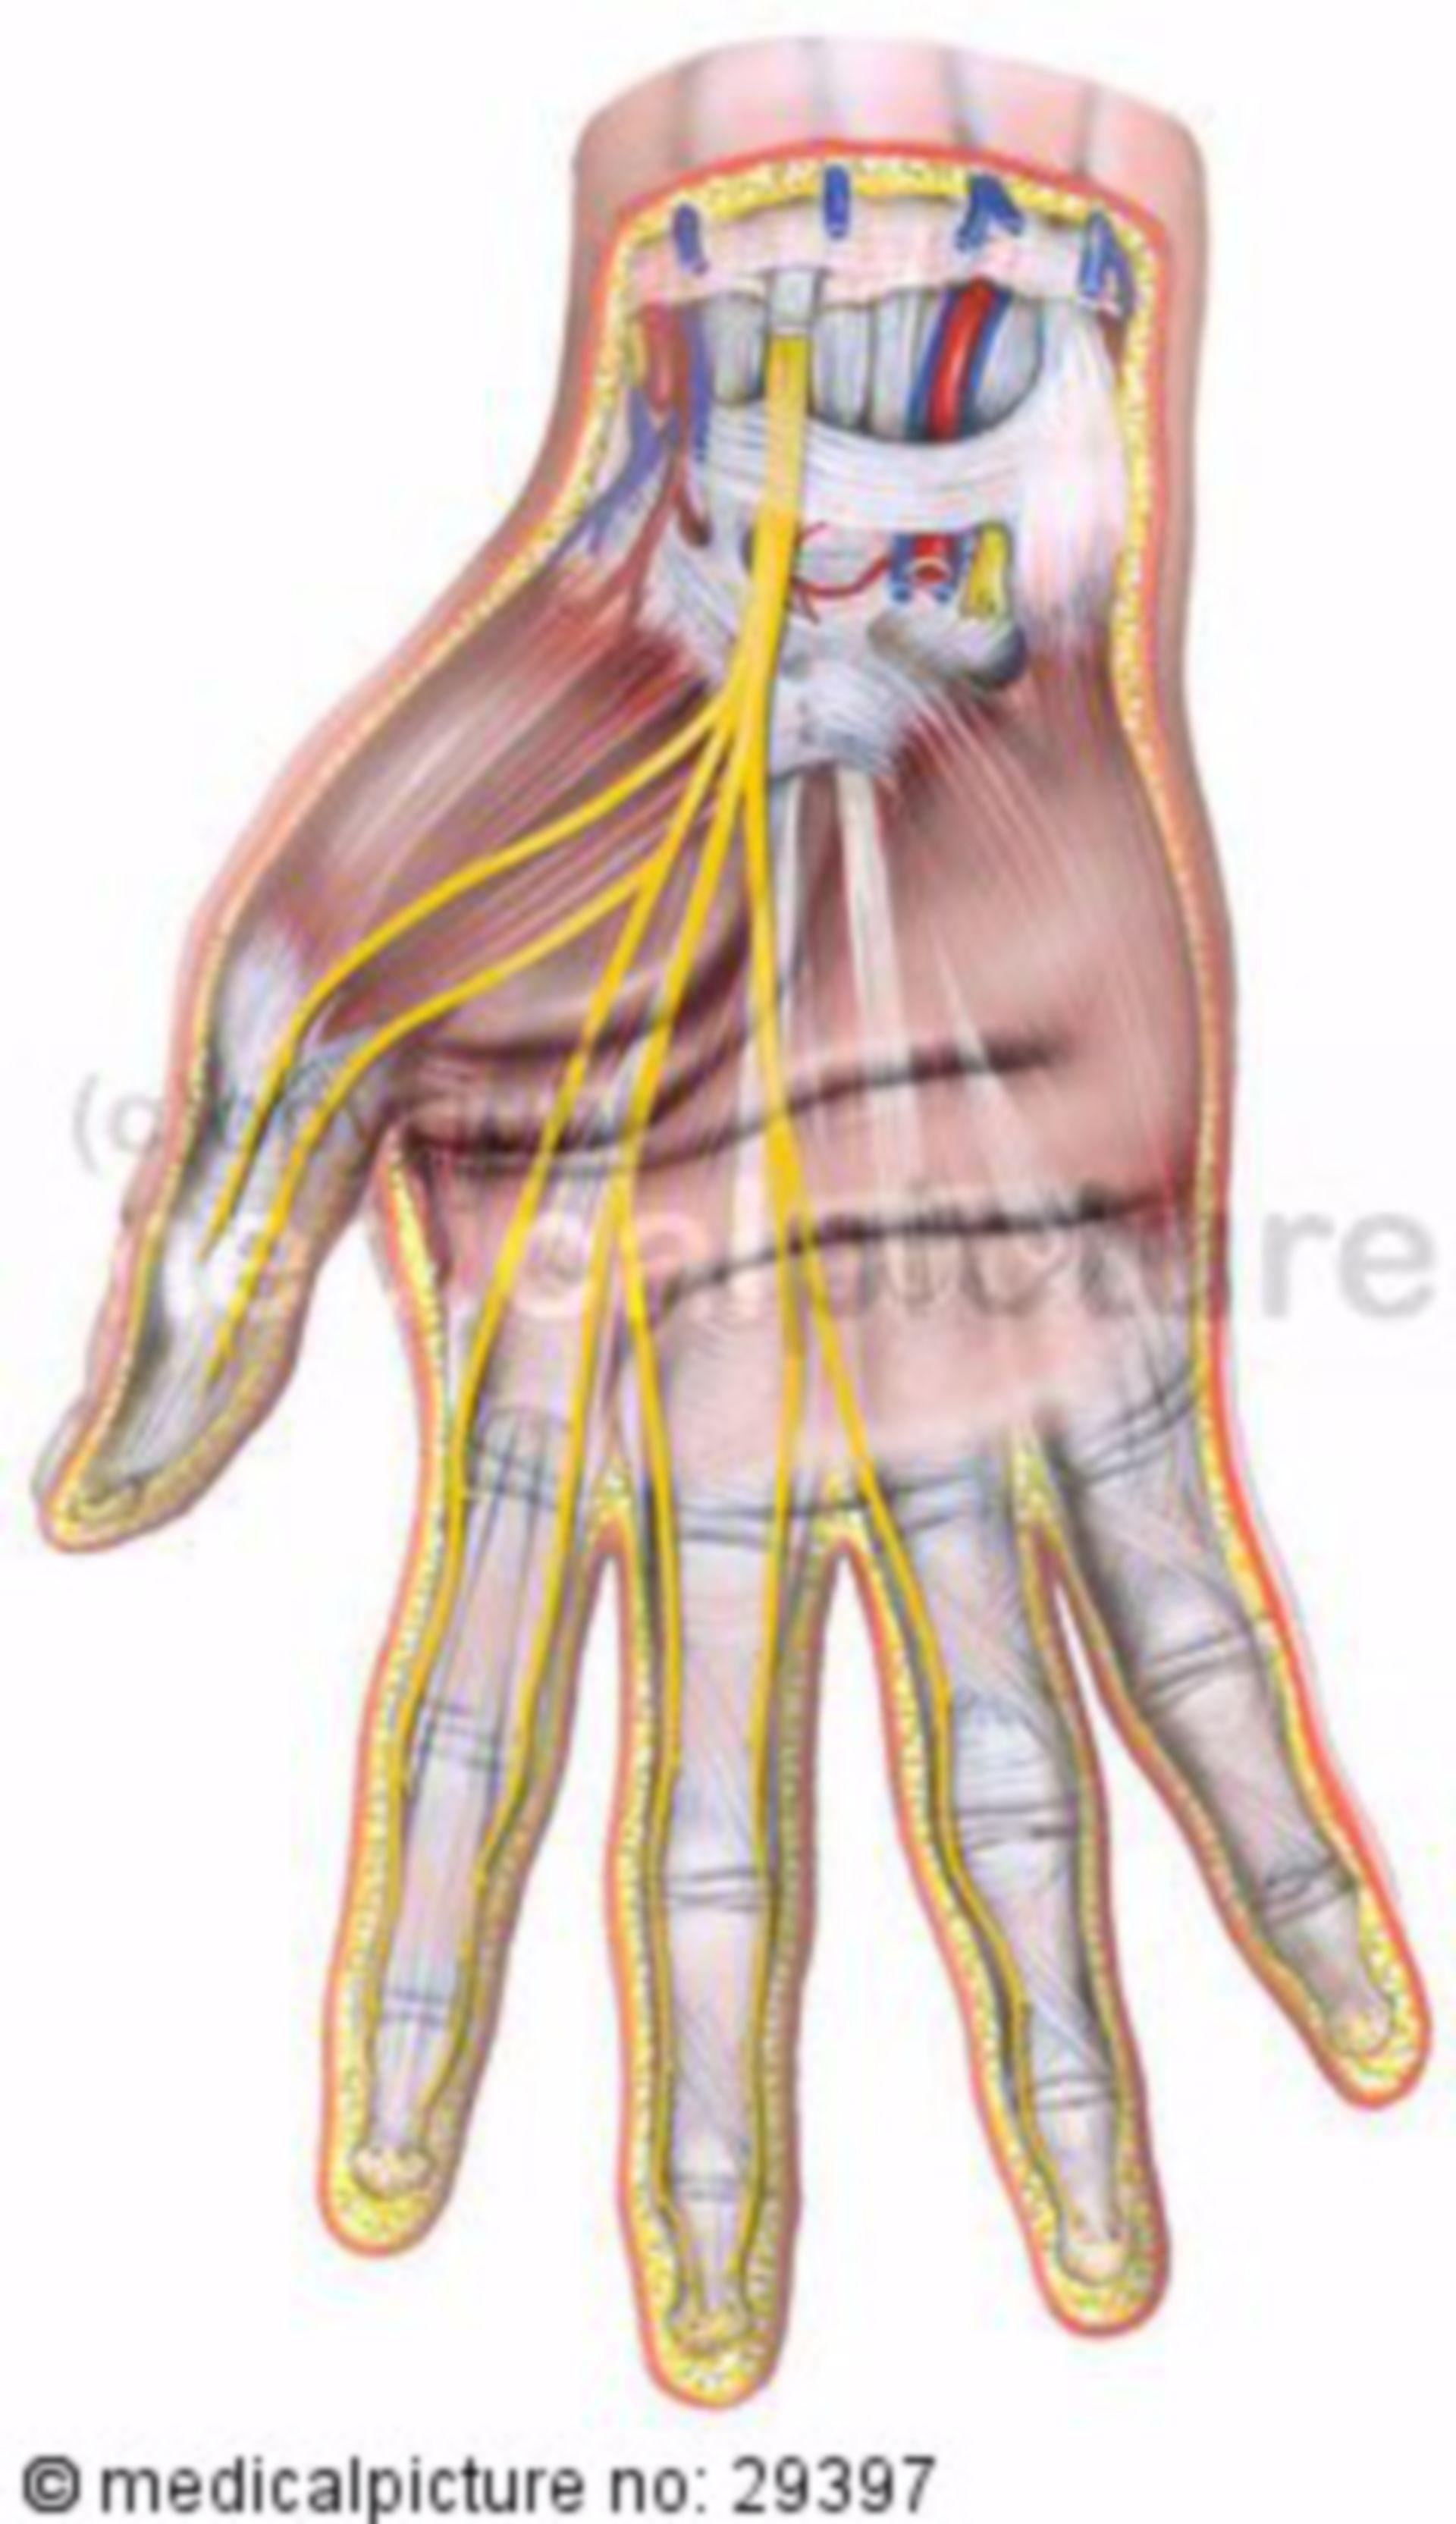 Nervo mediano della mano destra